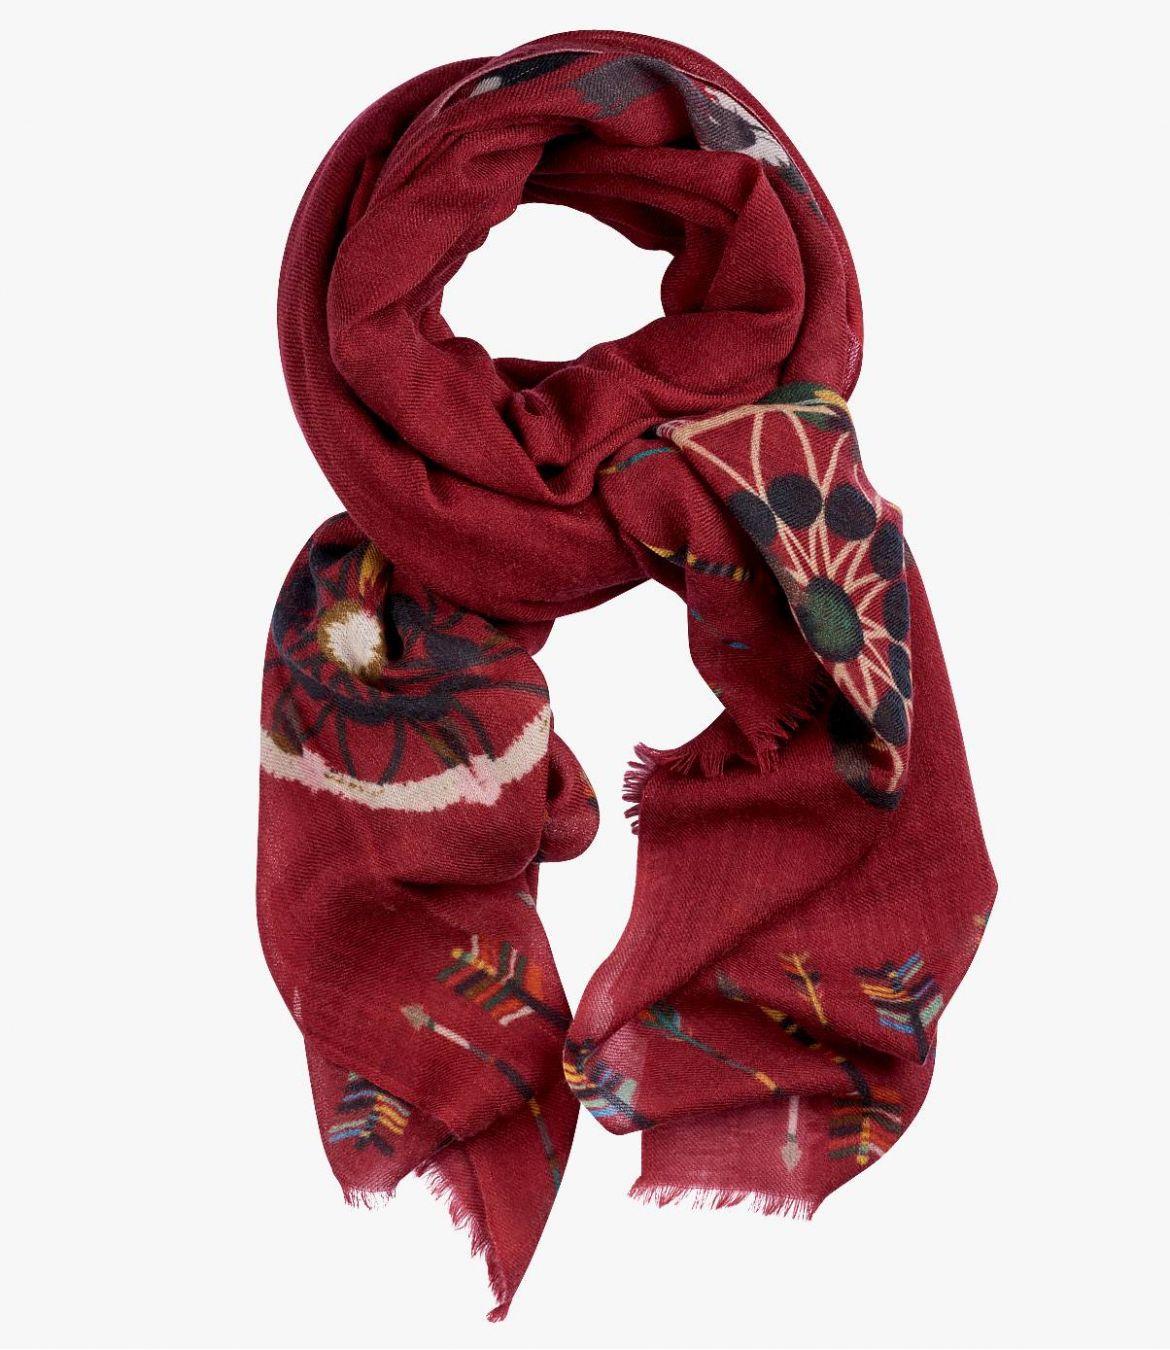 REVE Women's Wool Scarf 90x200 cm Storiatipic - 6